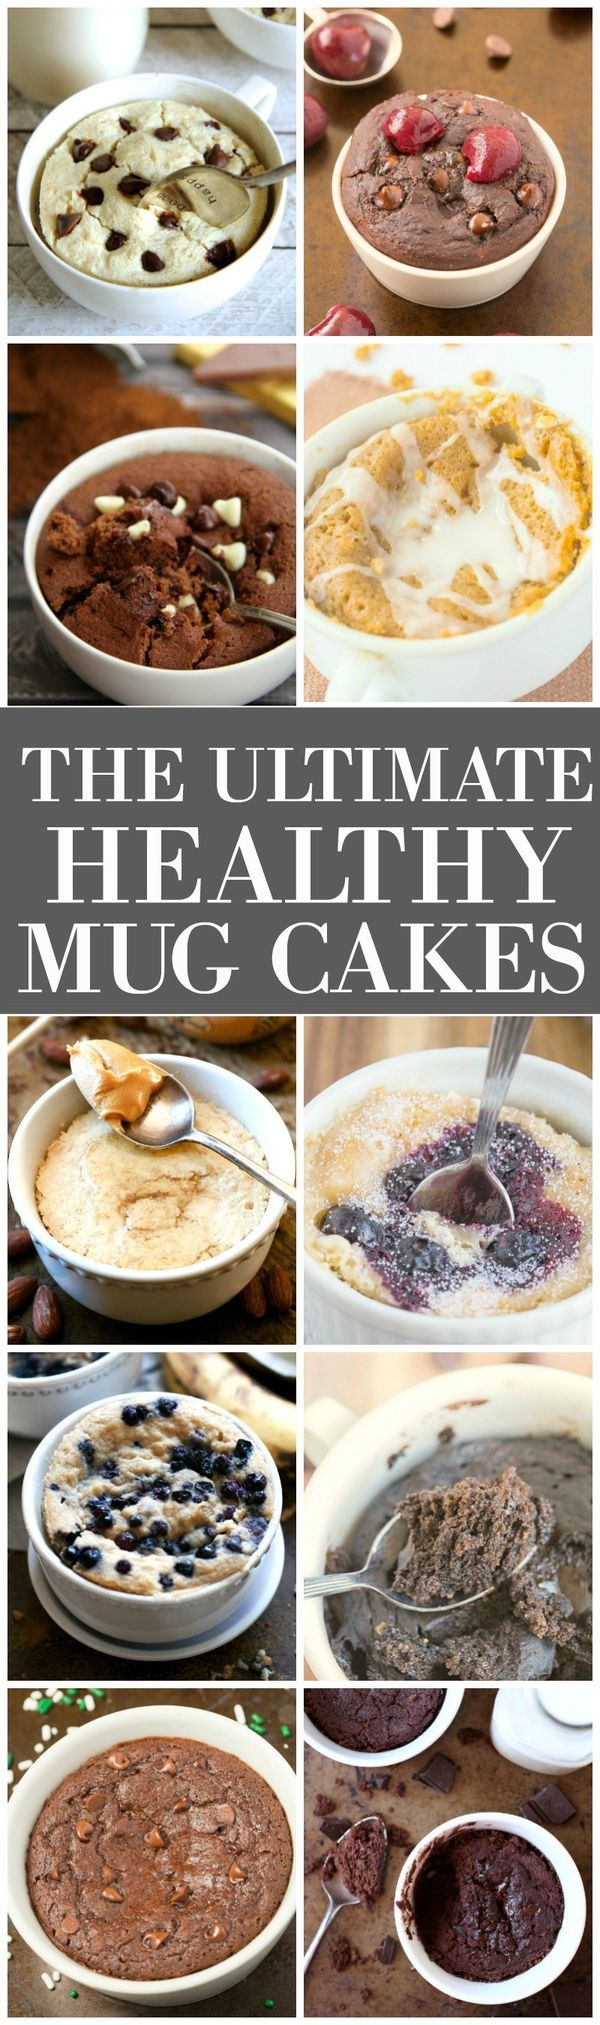 The Ultimate Healthy and Delicious Mug Cakes | Mug cake ...